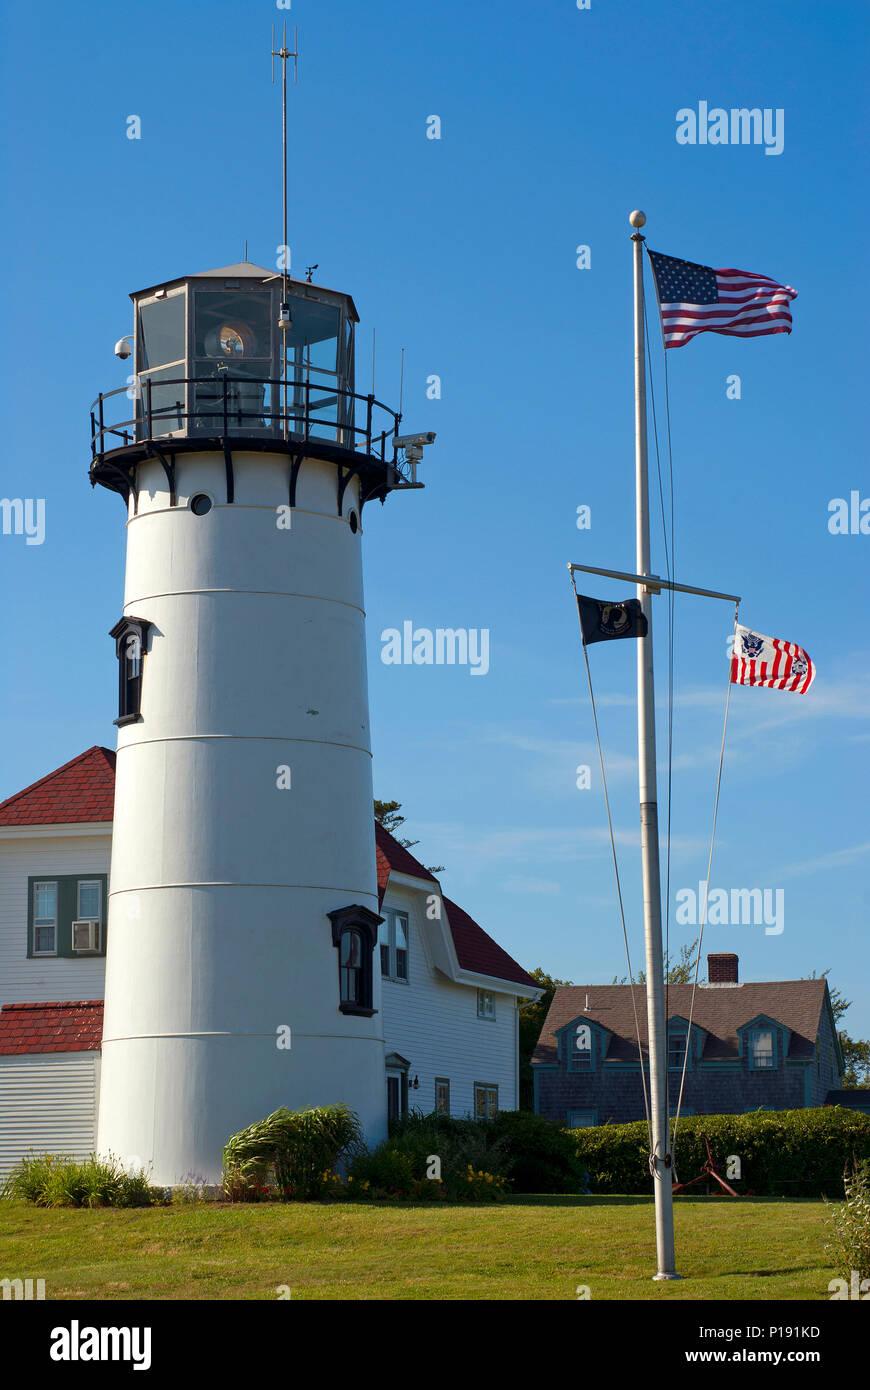 Chatham Lighthouse, Chatham, Barnstable County, Cape Cod, Massachusetts, USA - Stock Image